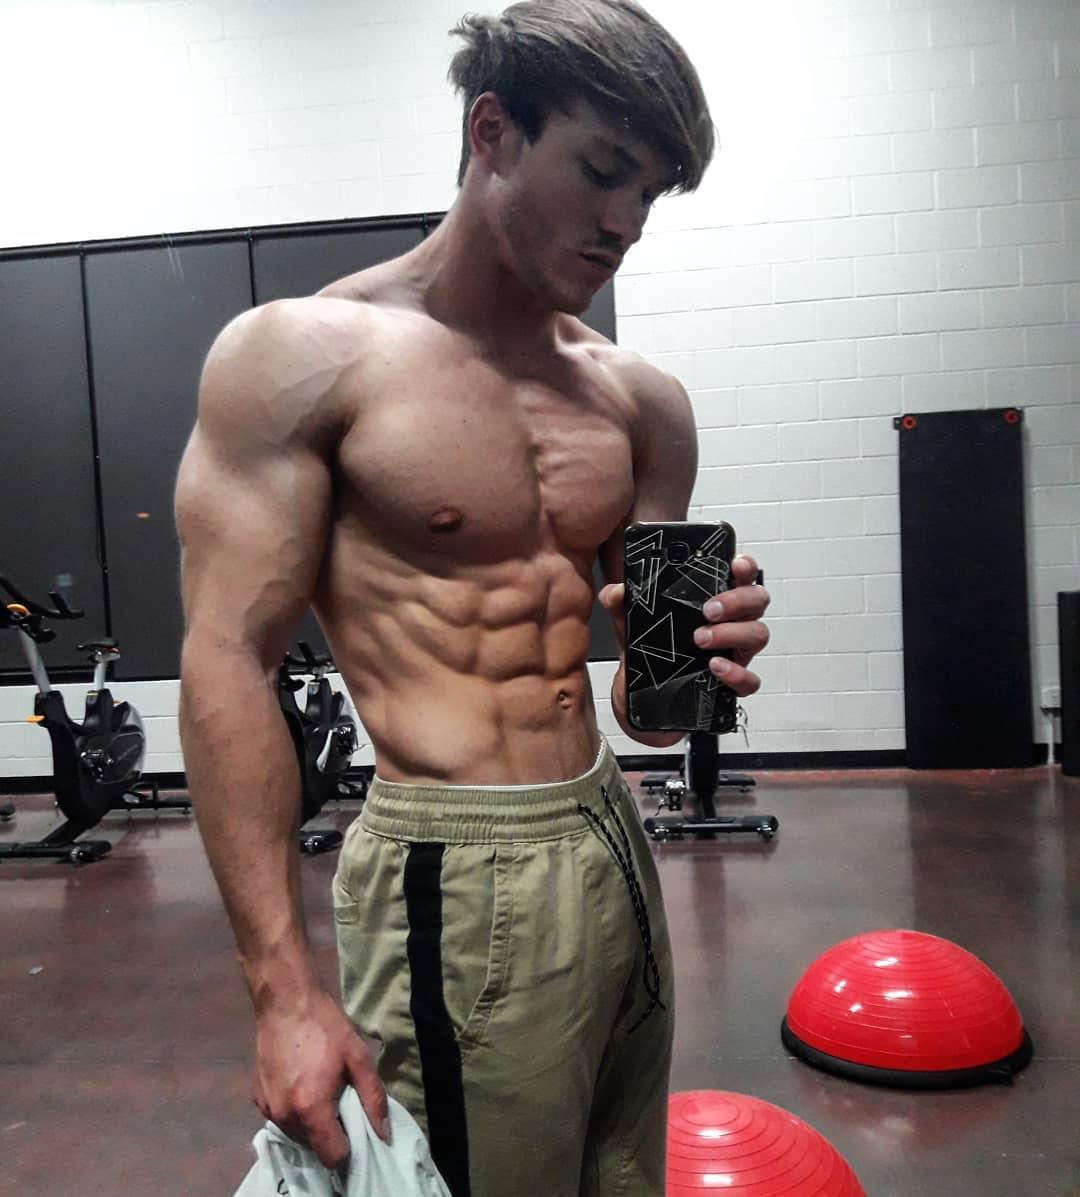 hot-barechest-gym-guys-jason-bjarnson-ripped-sixpack-abs-selfie